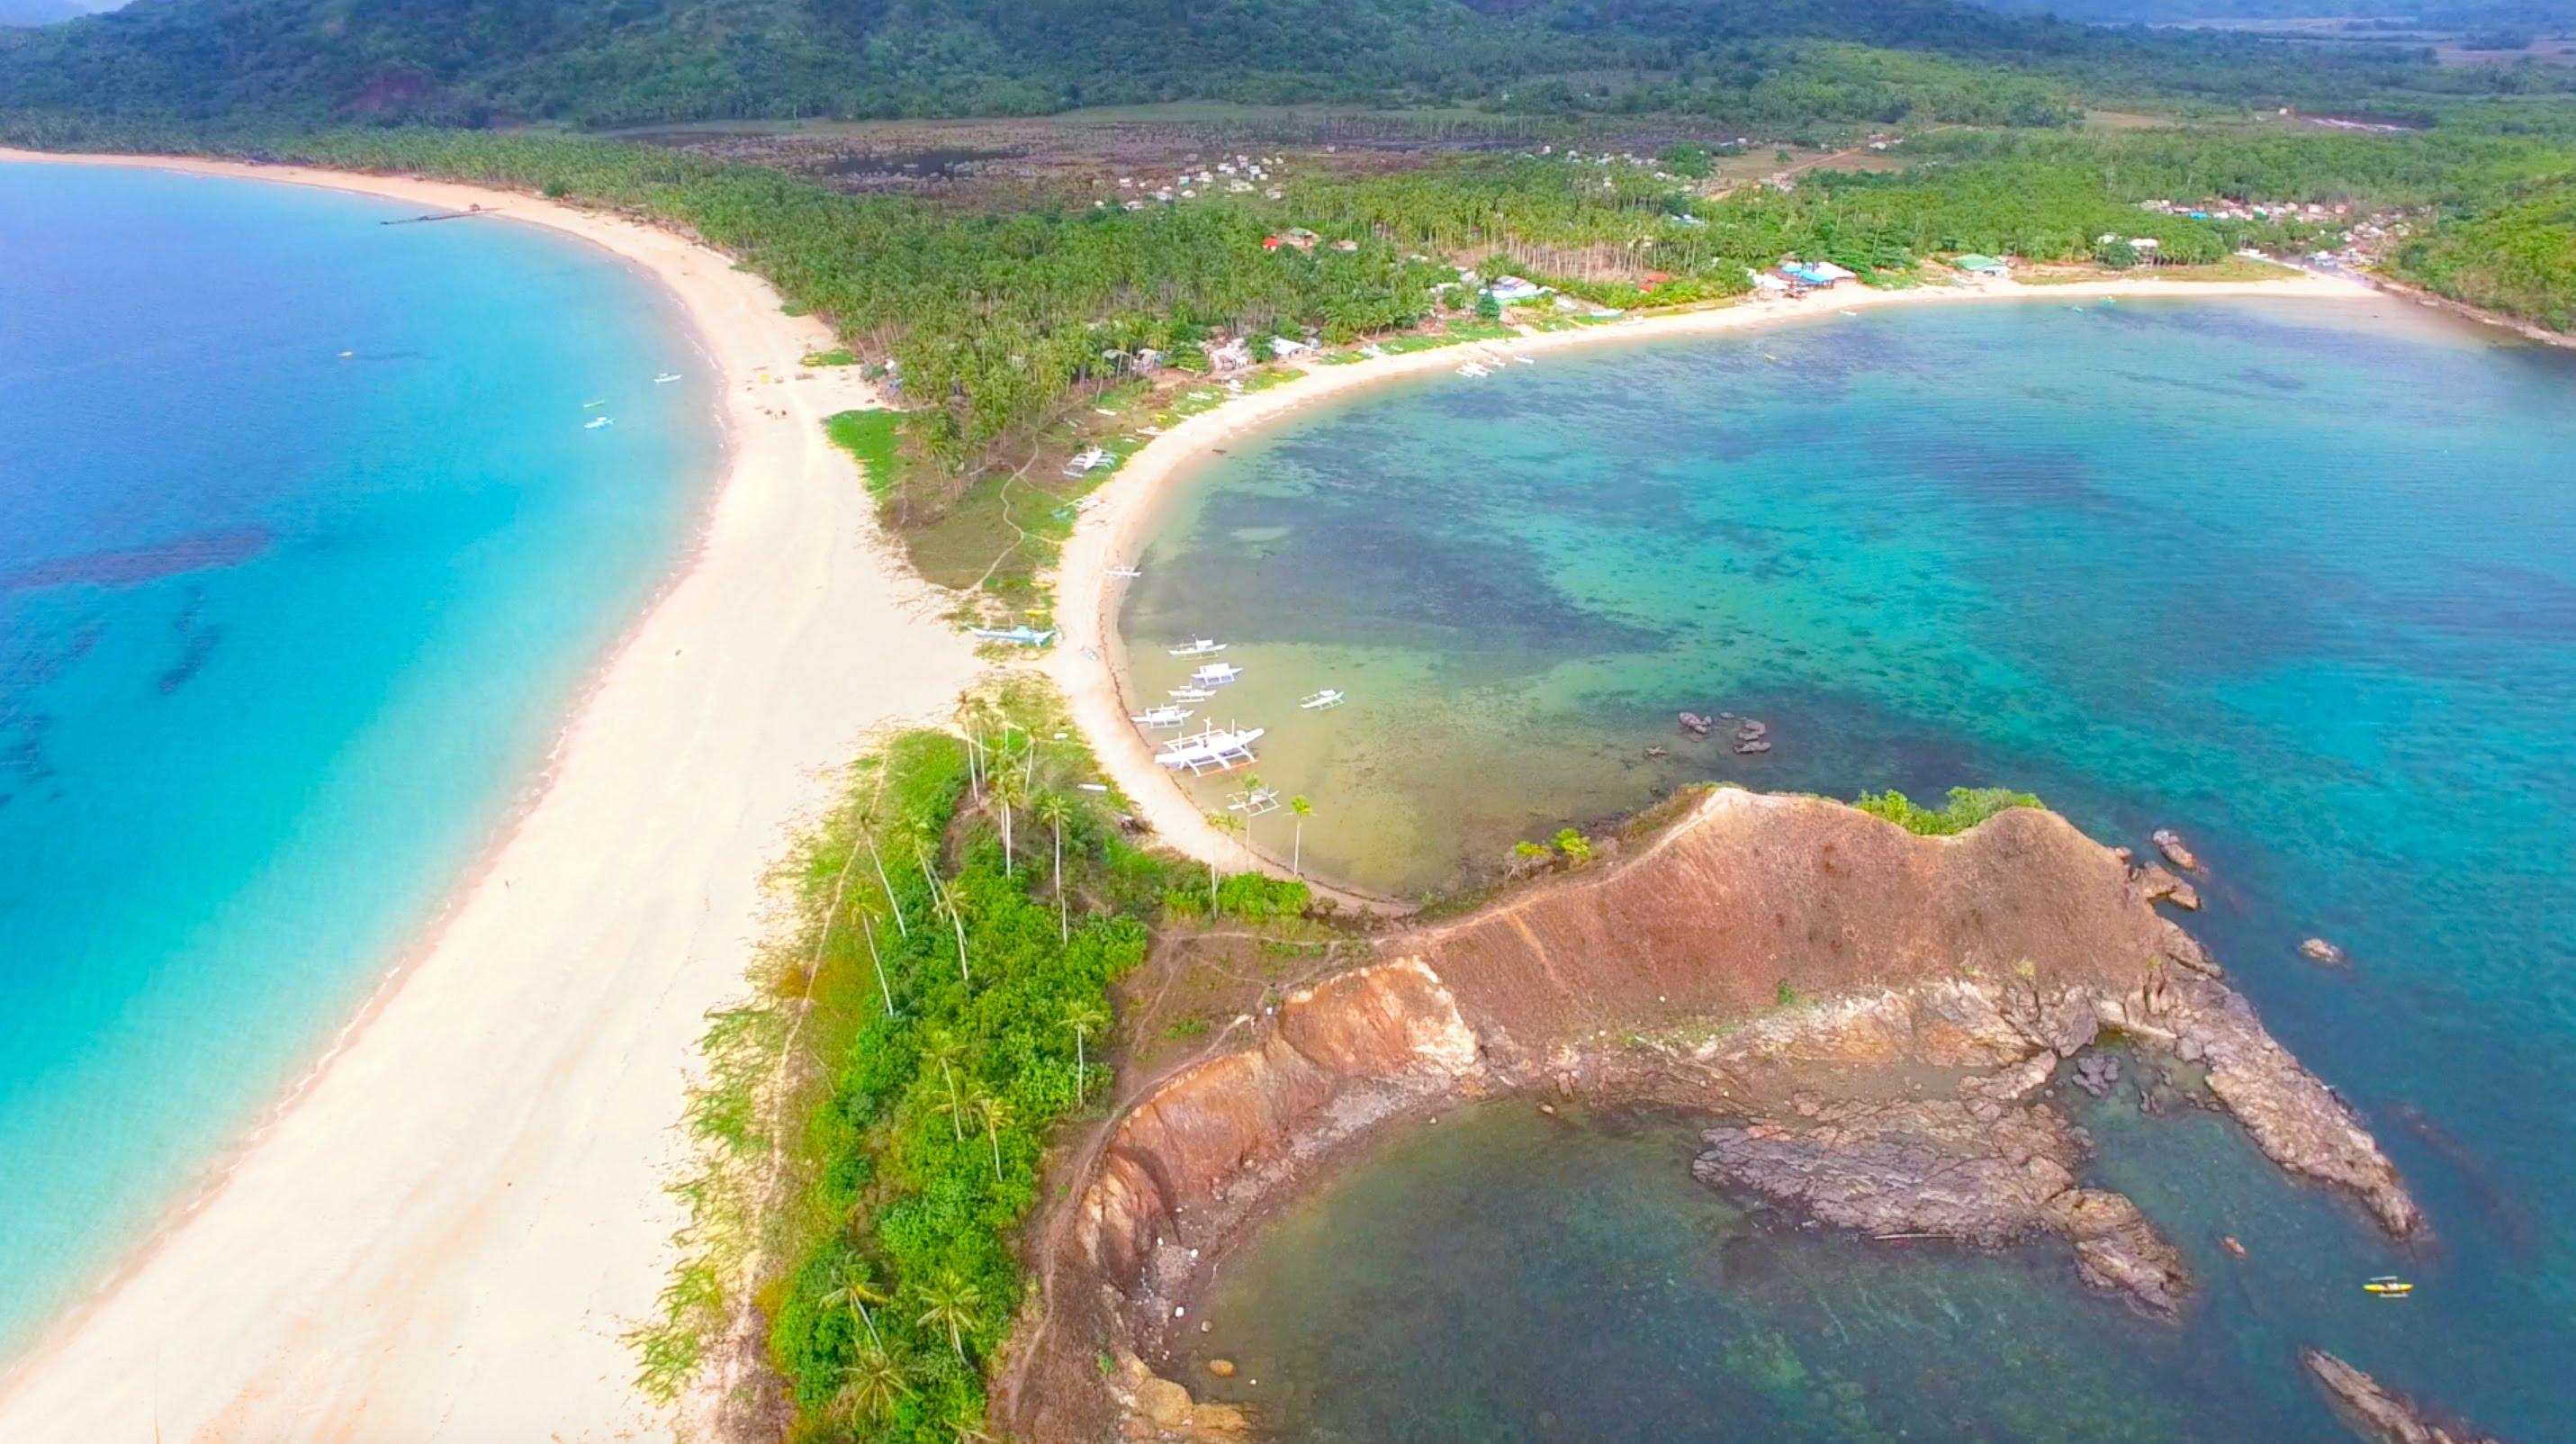 Nacpan Beach In Palawan, Philippines Is The Most Beautiful Beach